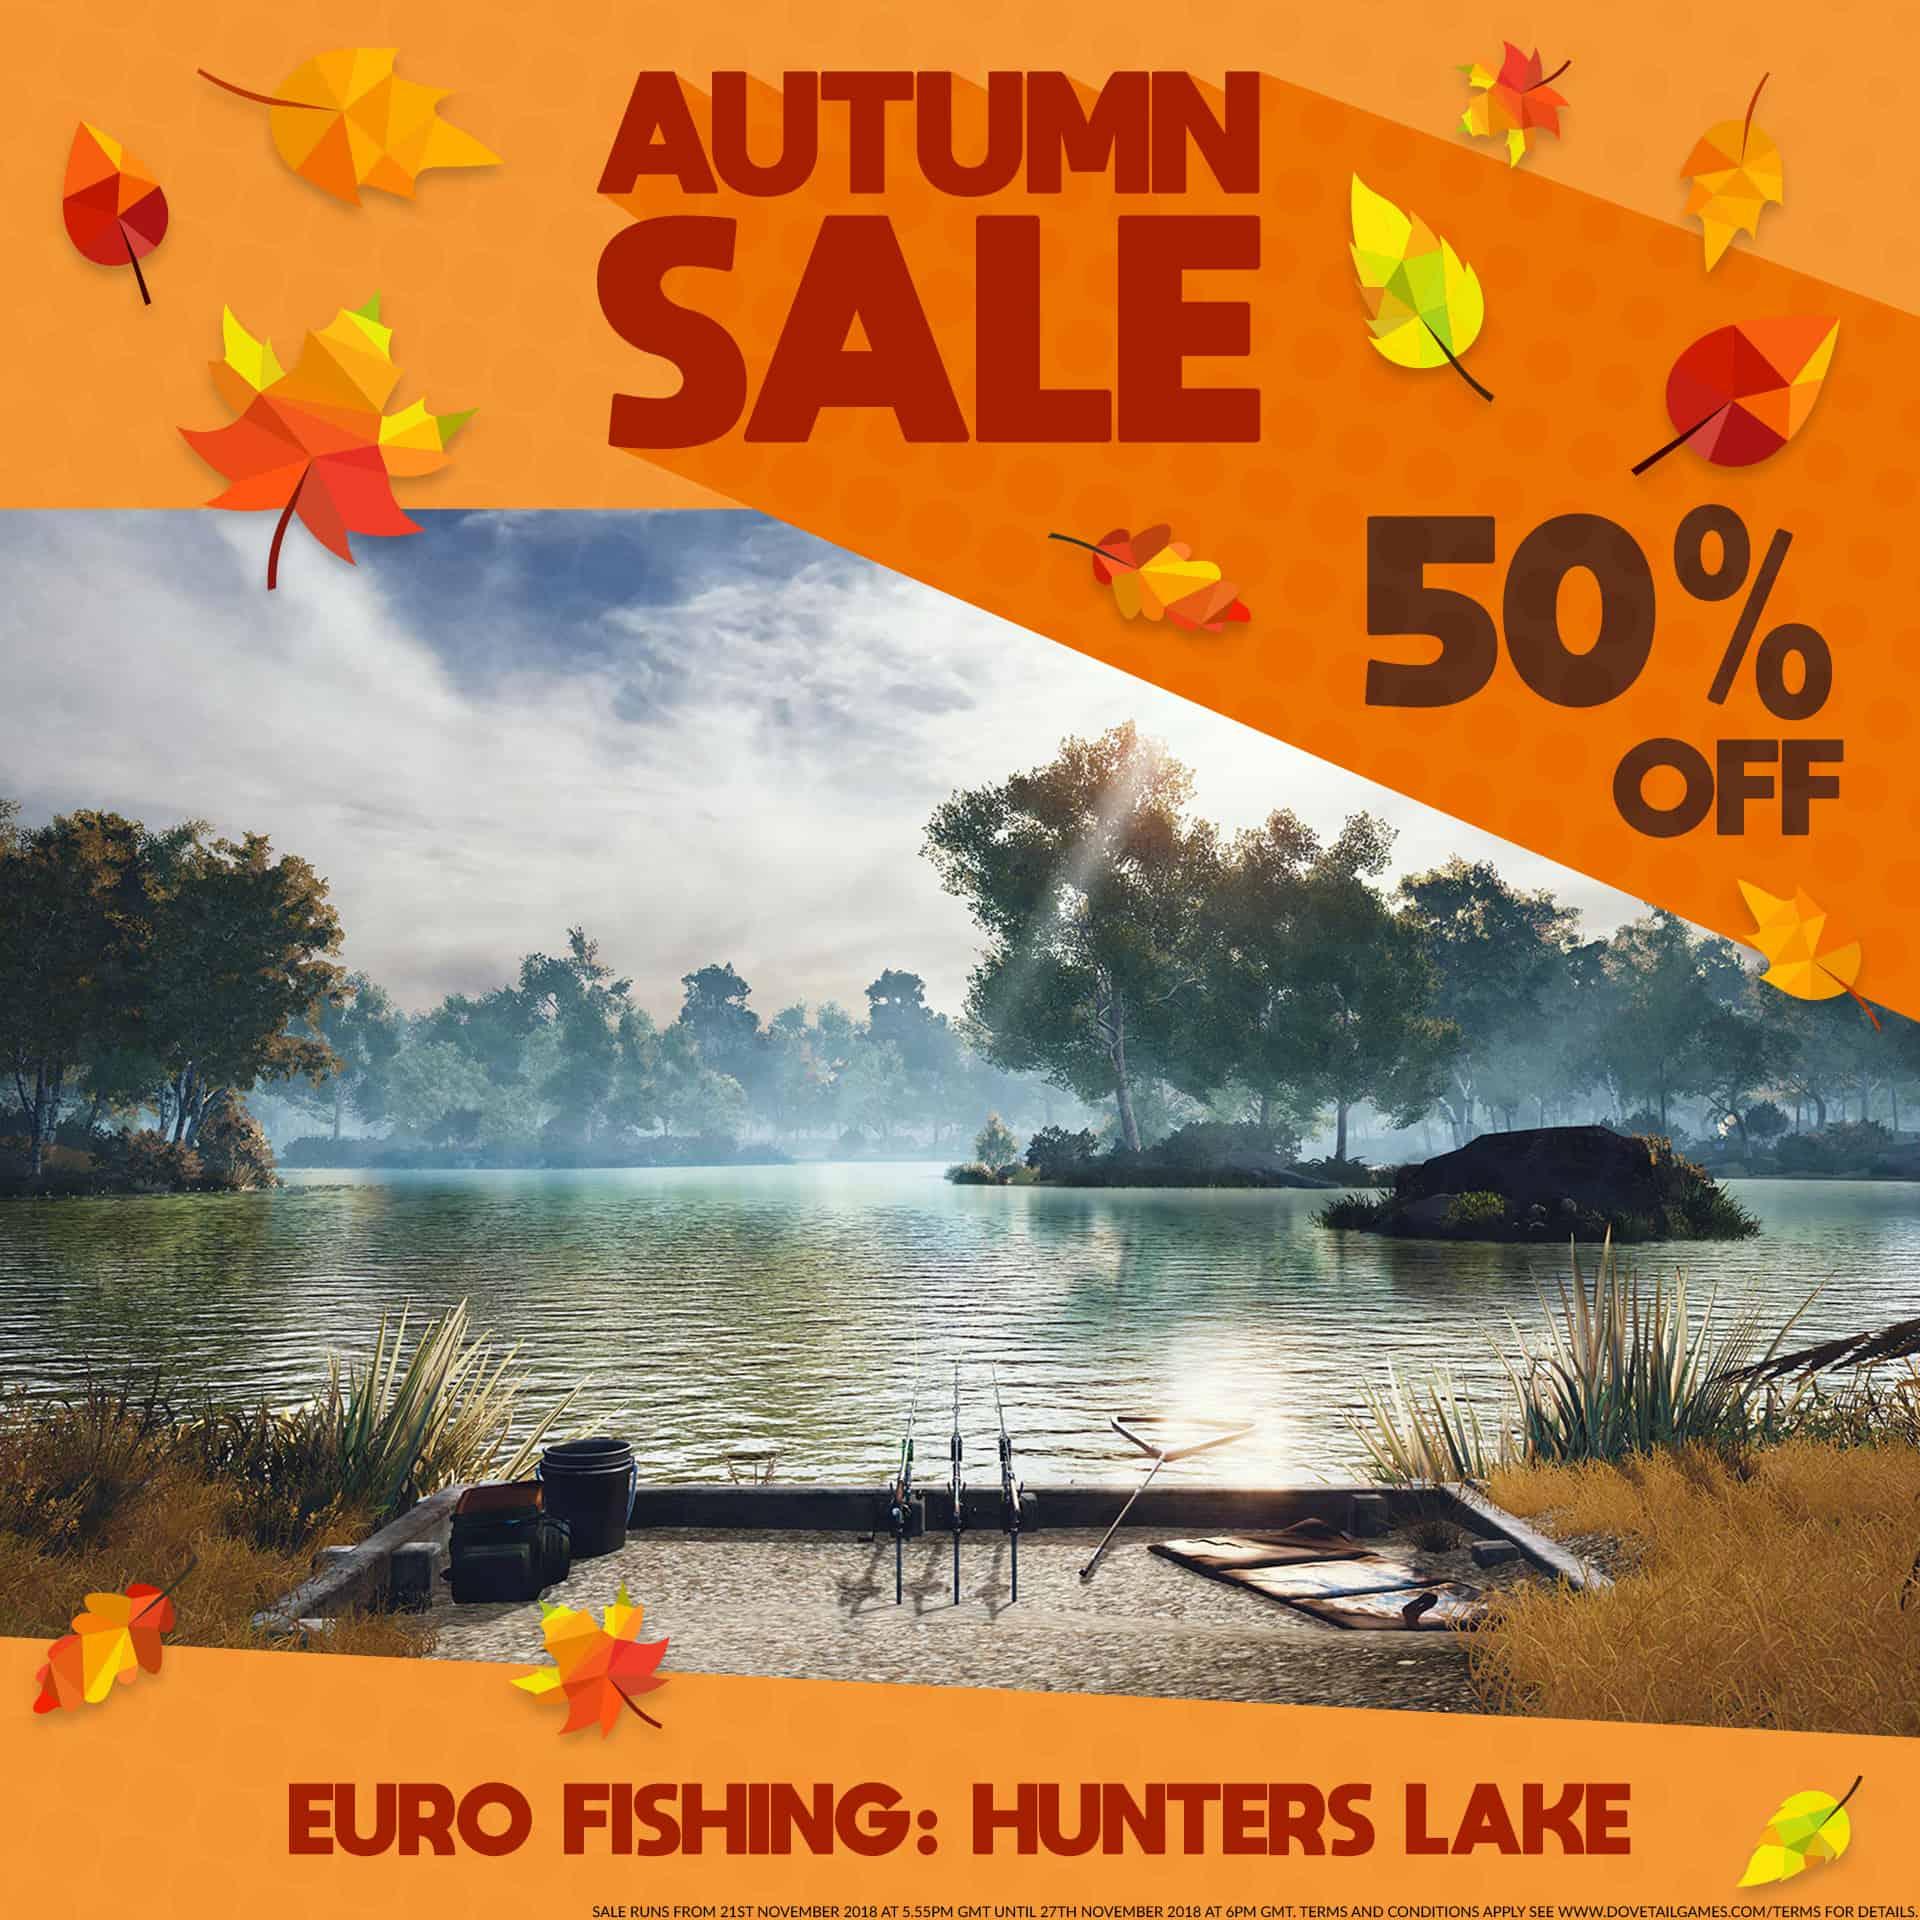 AutumnSale_Products_HuntersLake